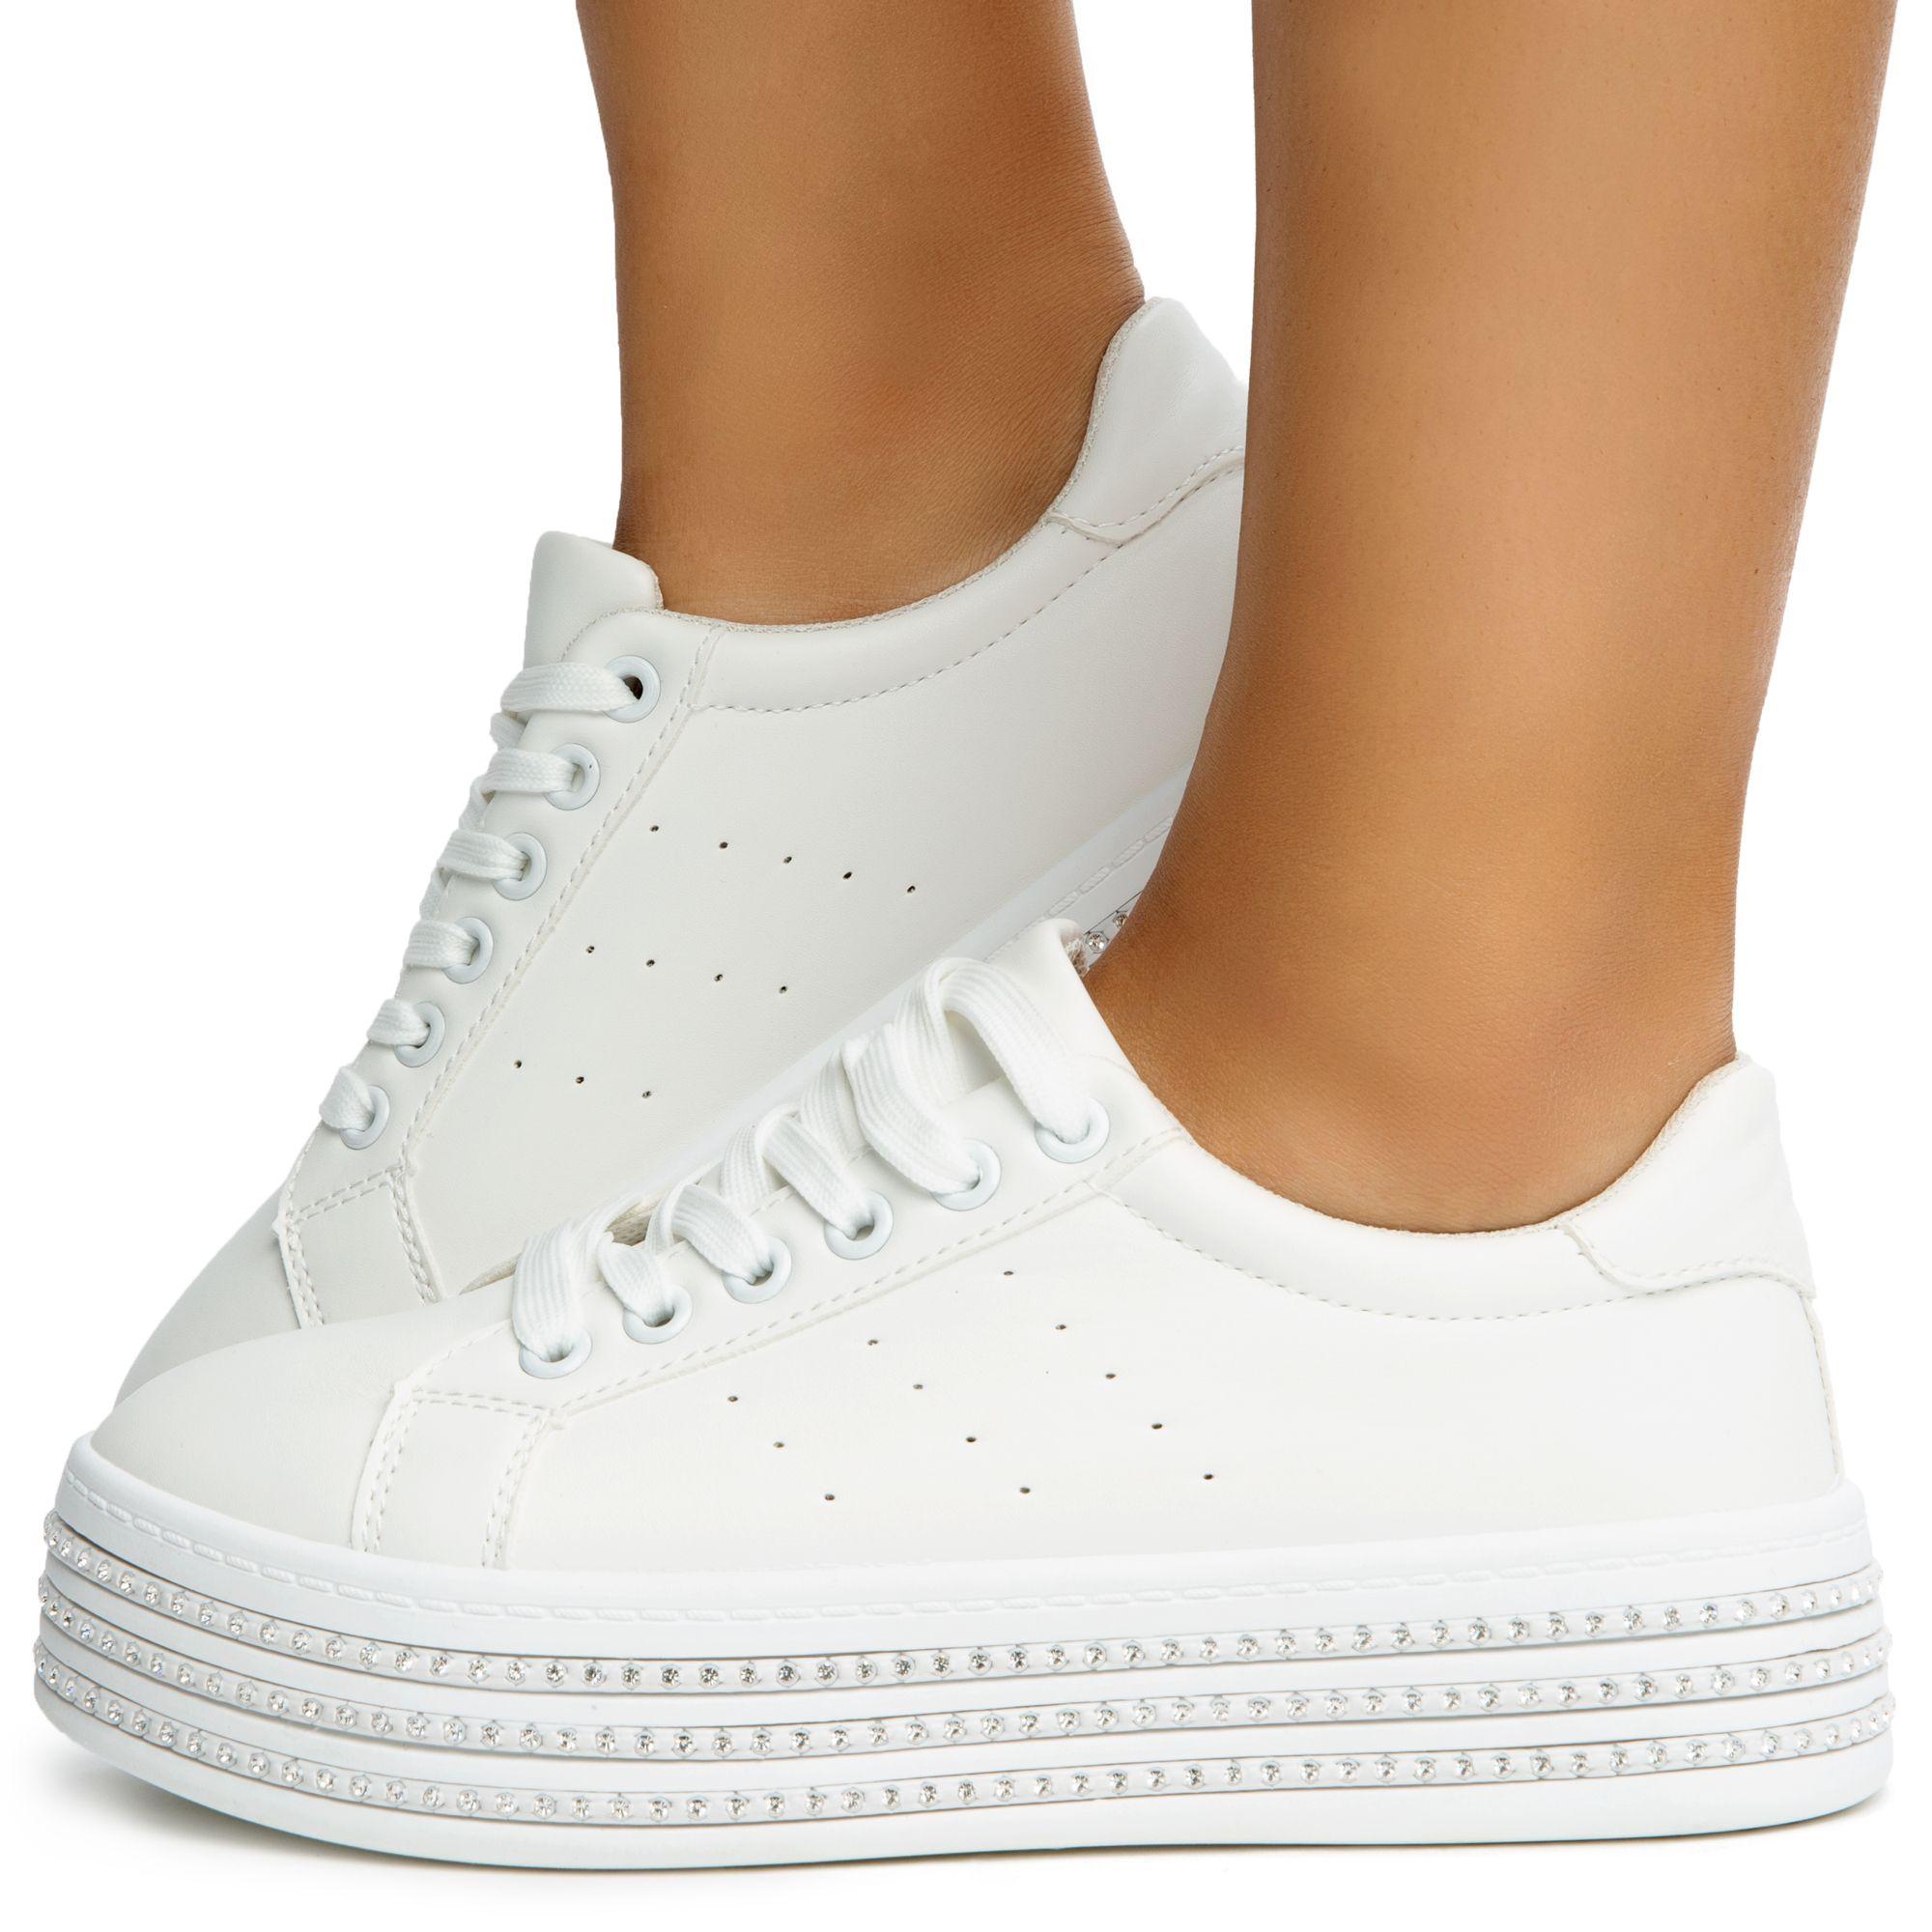 sneakers white platform